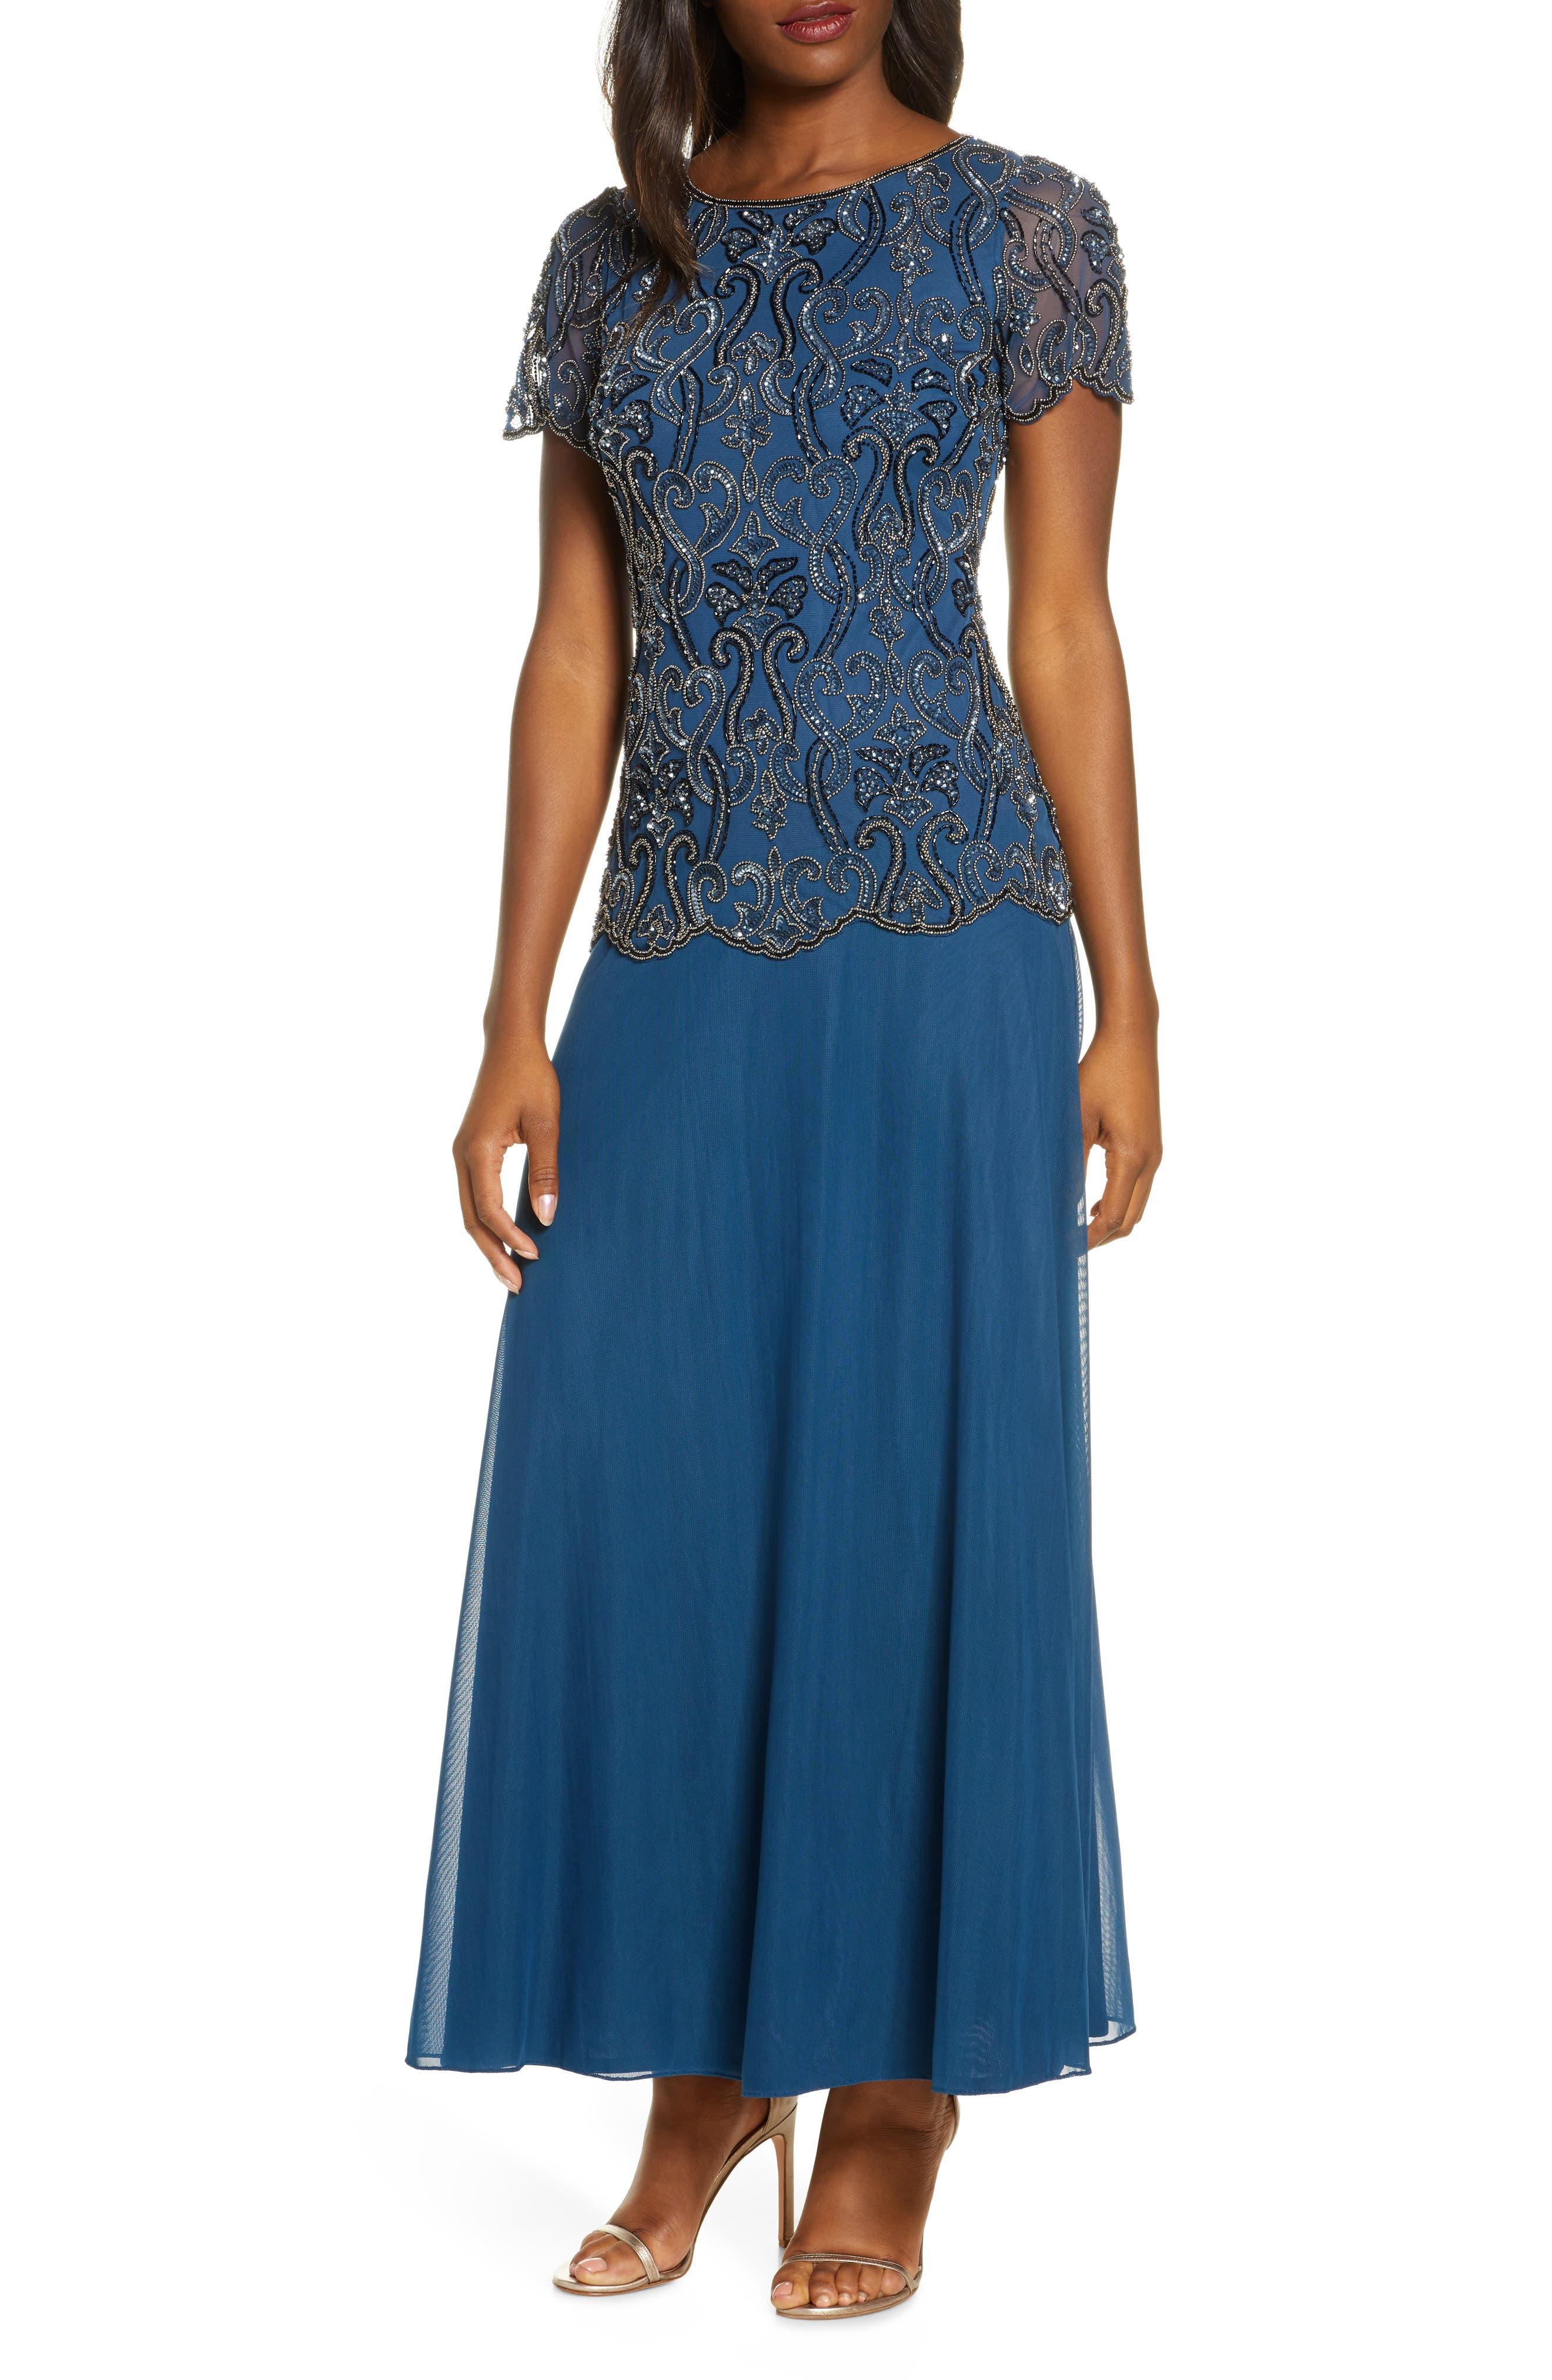 Charleston Dress: Fringe Flapper Dress Womens Pisarro Nights Bead Embellished Mock Two-Piece Gown $238.00 AT vintagedancer.com